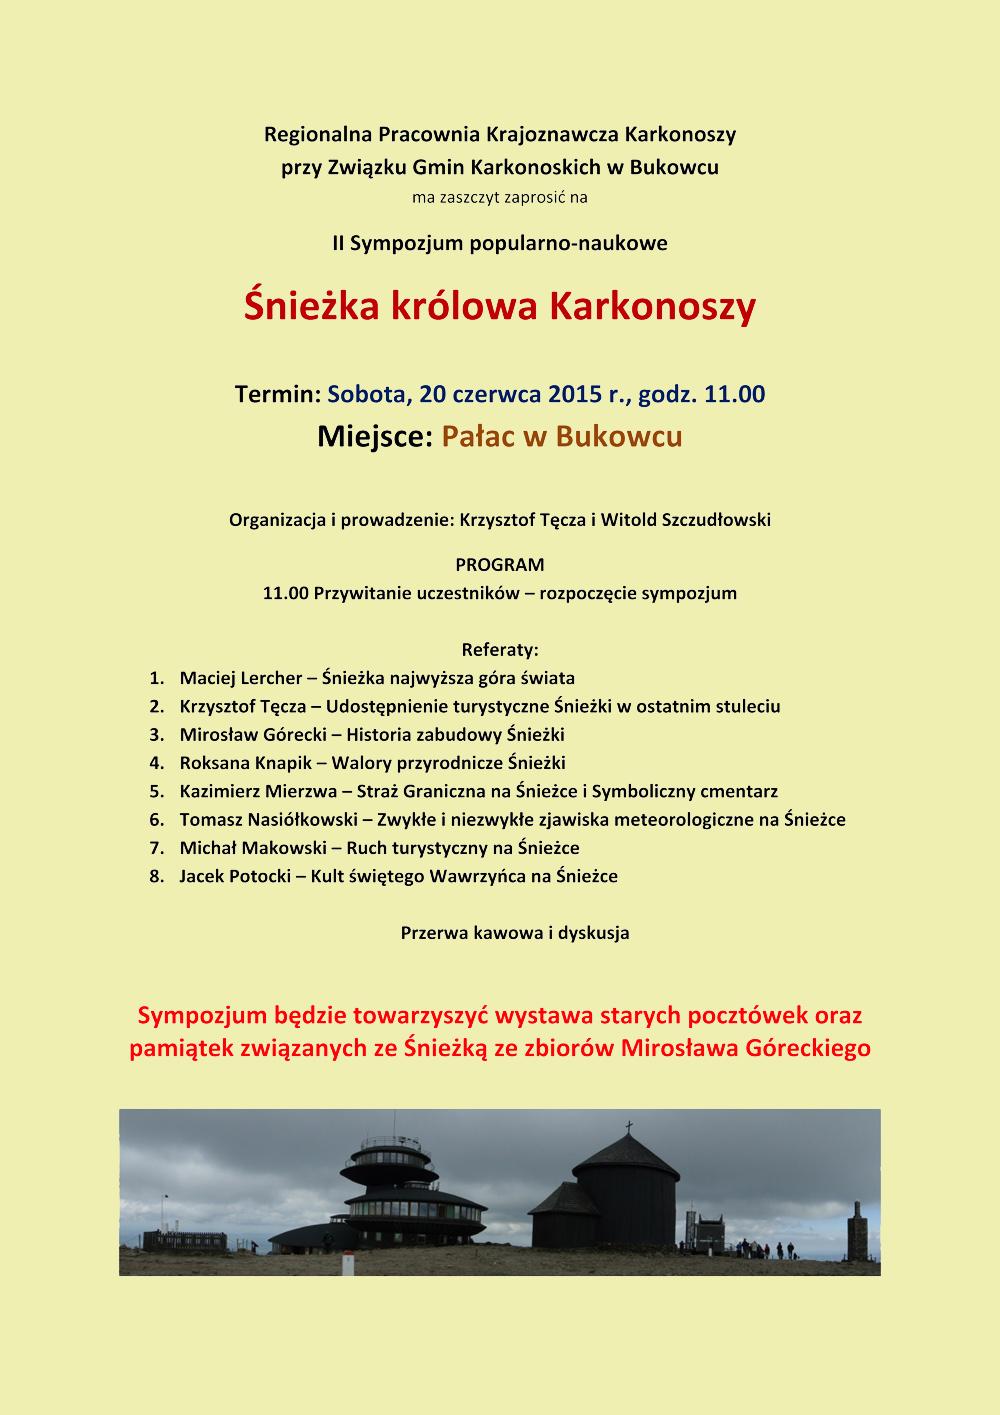 Microsoft Word - II Sympozjum w Bukowcu - A4